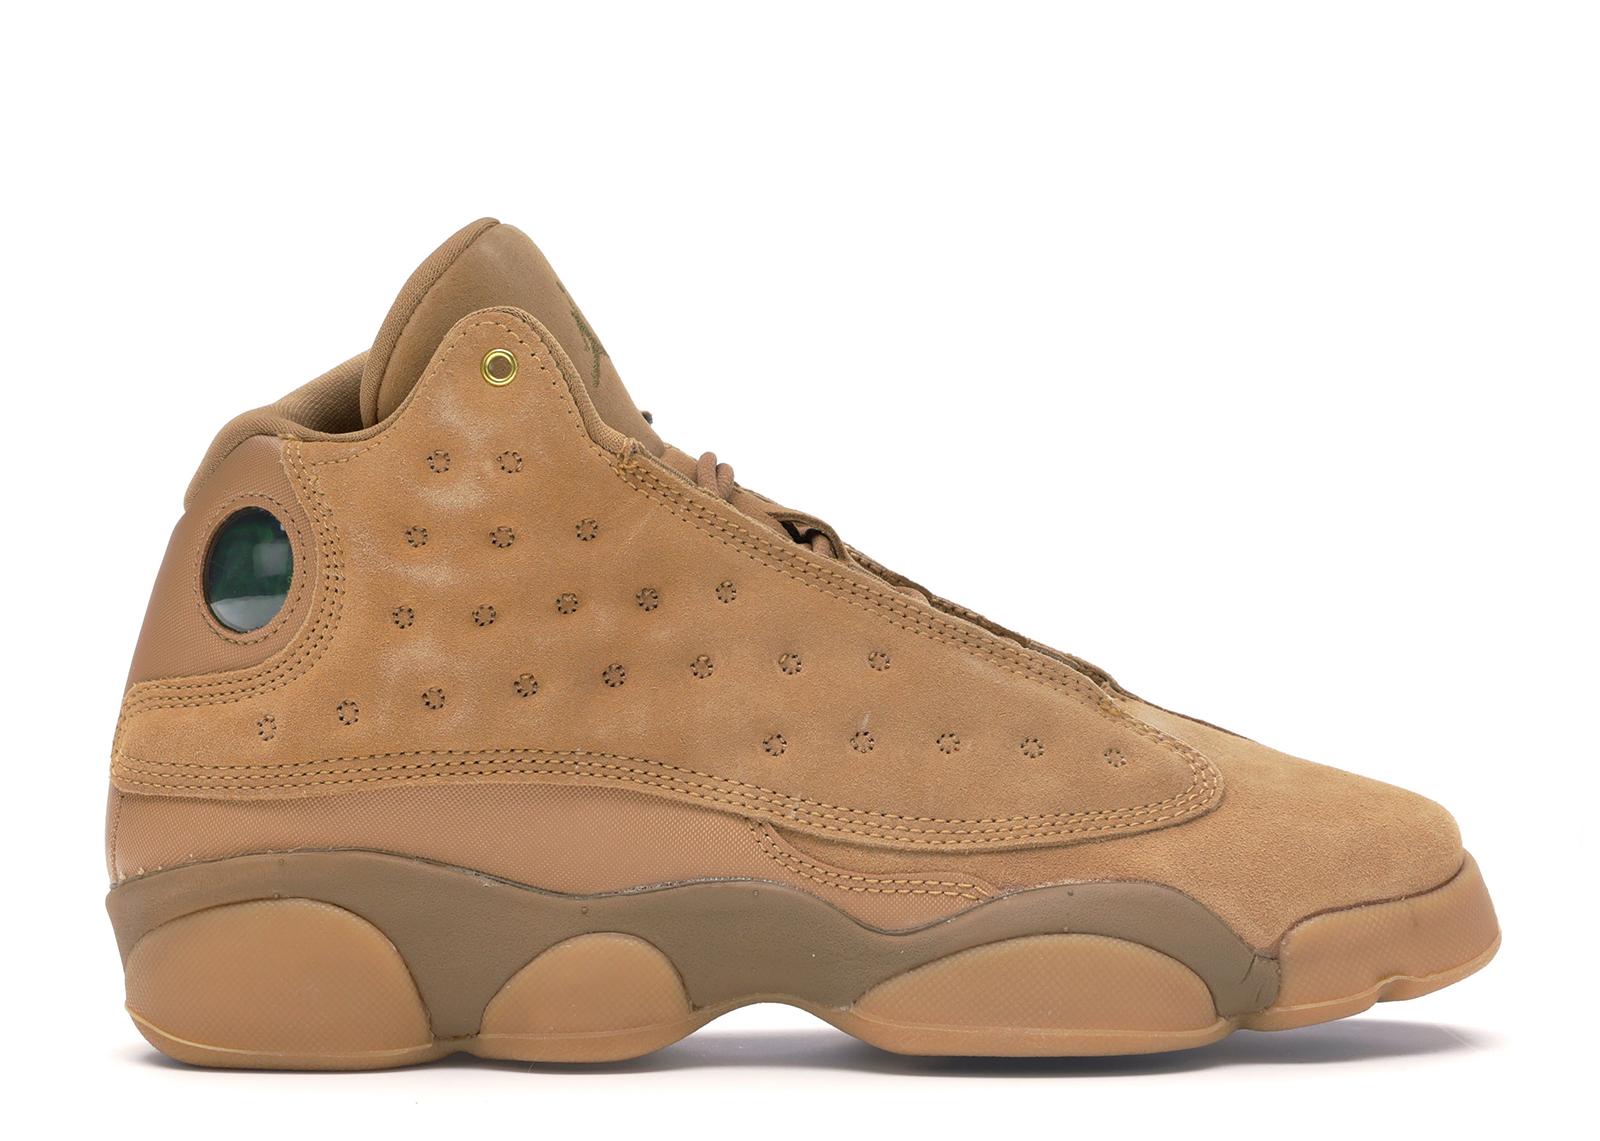 Jordan 13 Retro Wheat (GS)